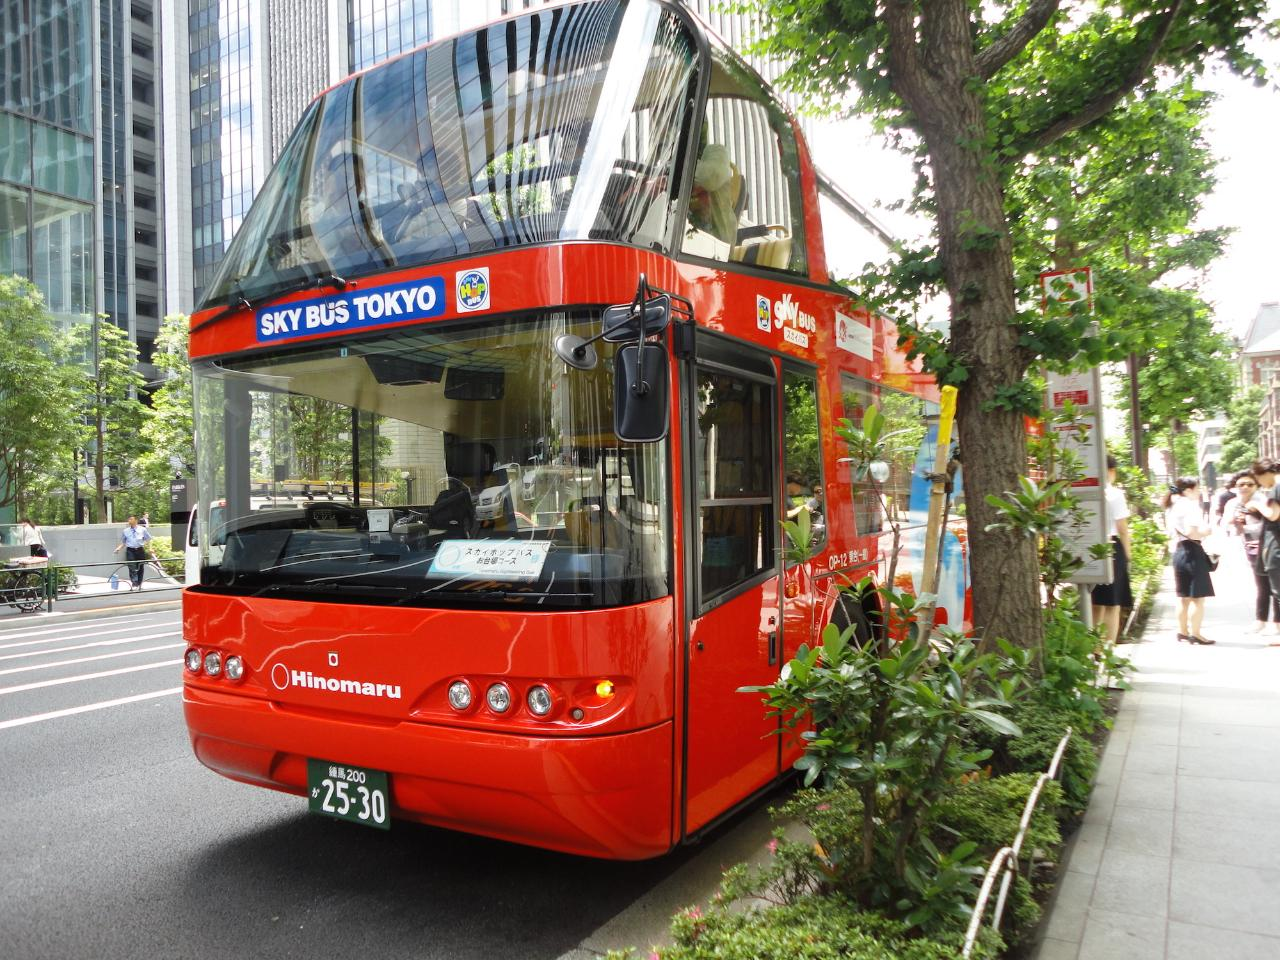 【SKY HOP BUS】Hop-on hop-off Tokyo sightseeing bus  / 終日乗り降り自由に東京観光